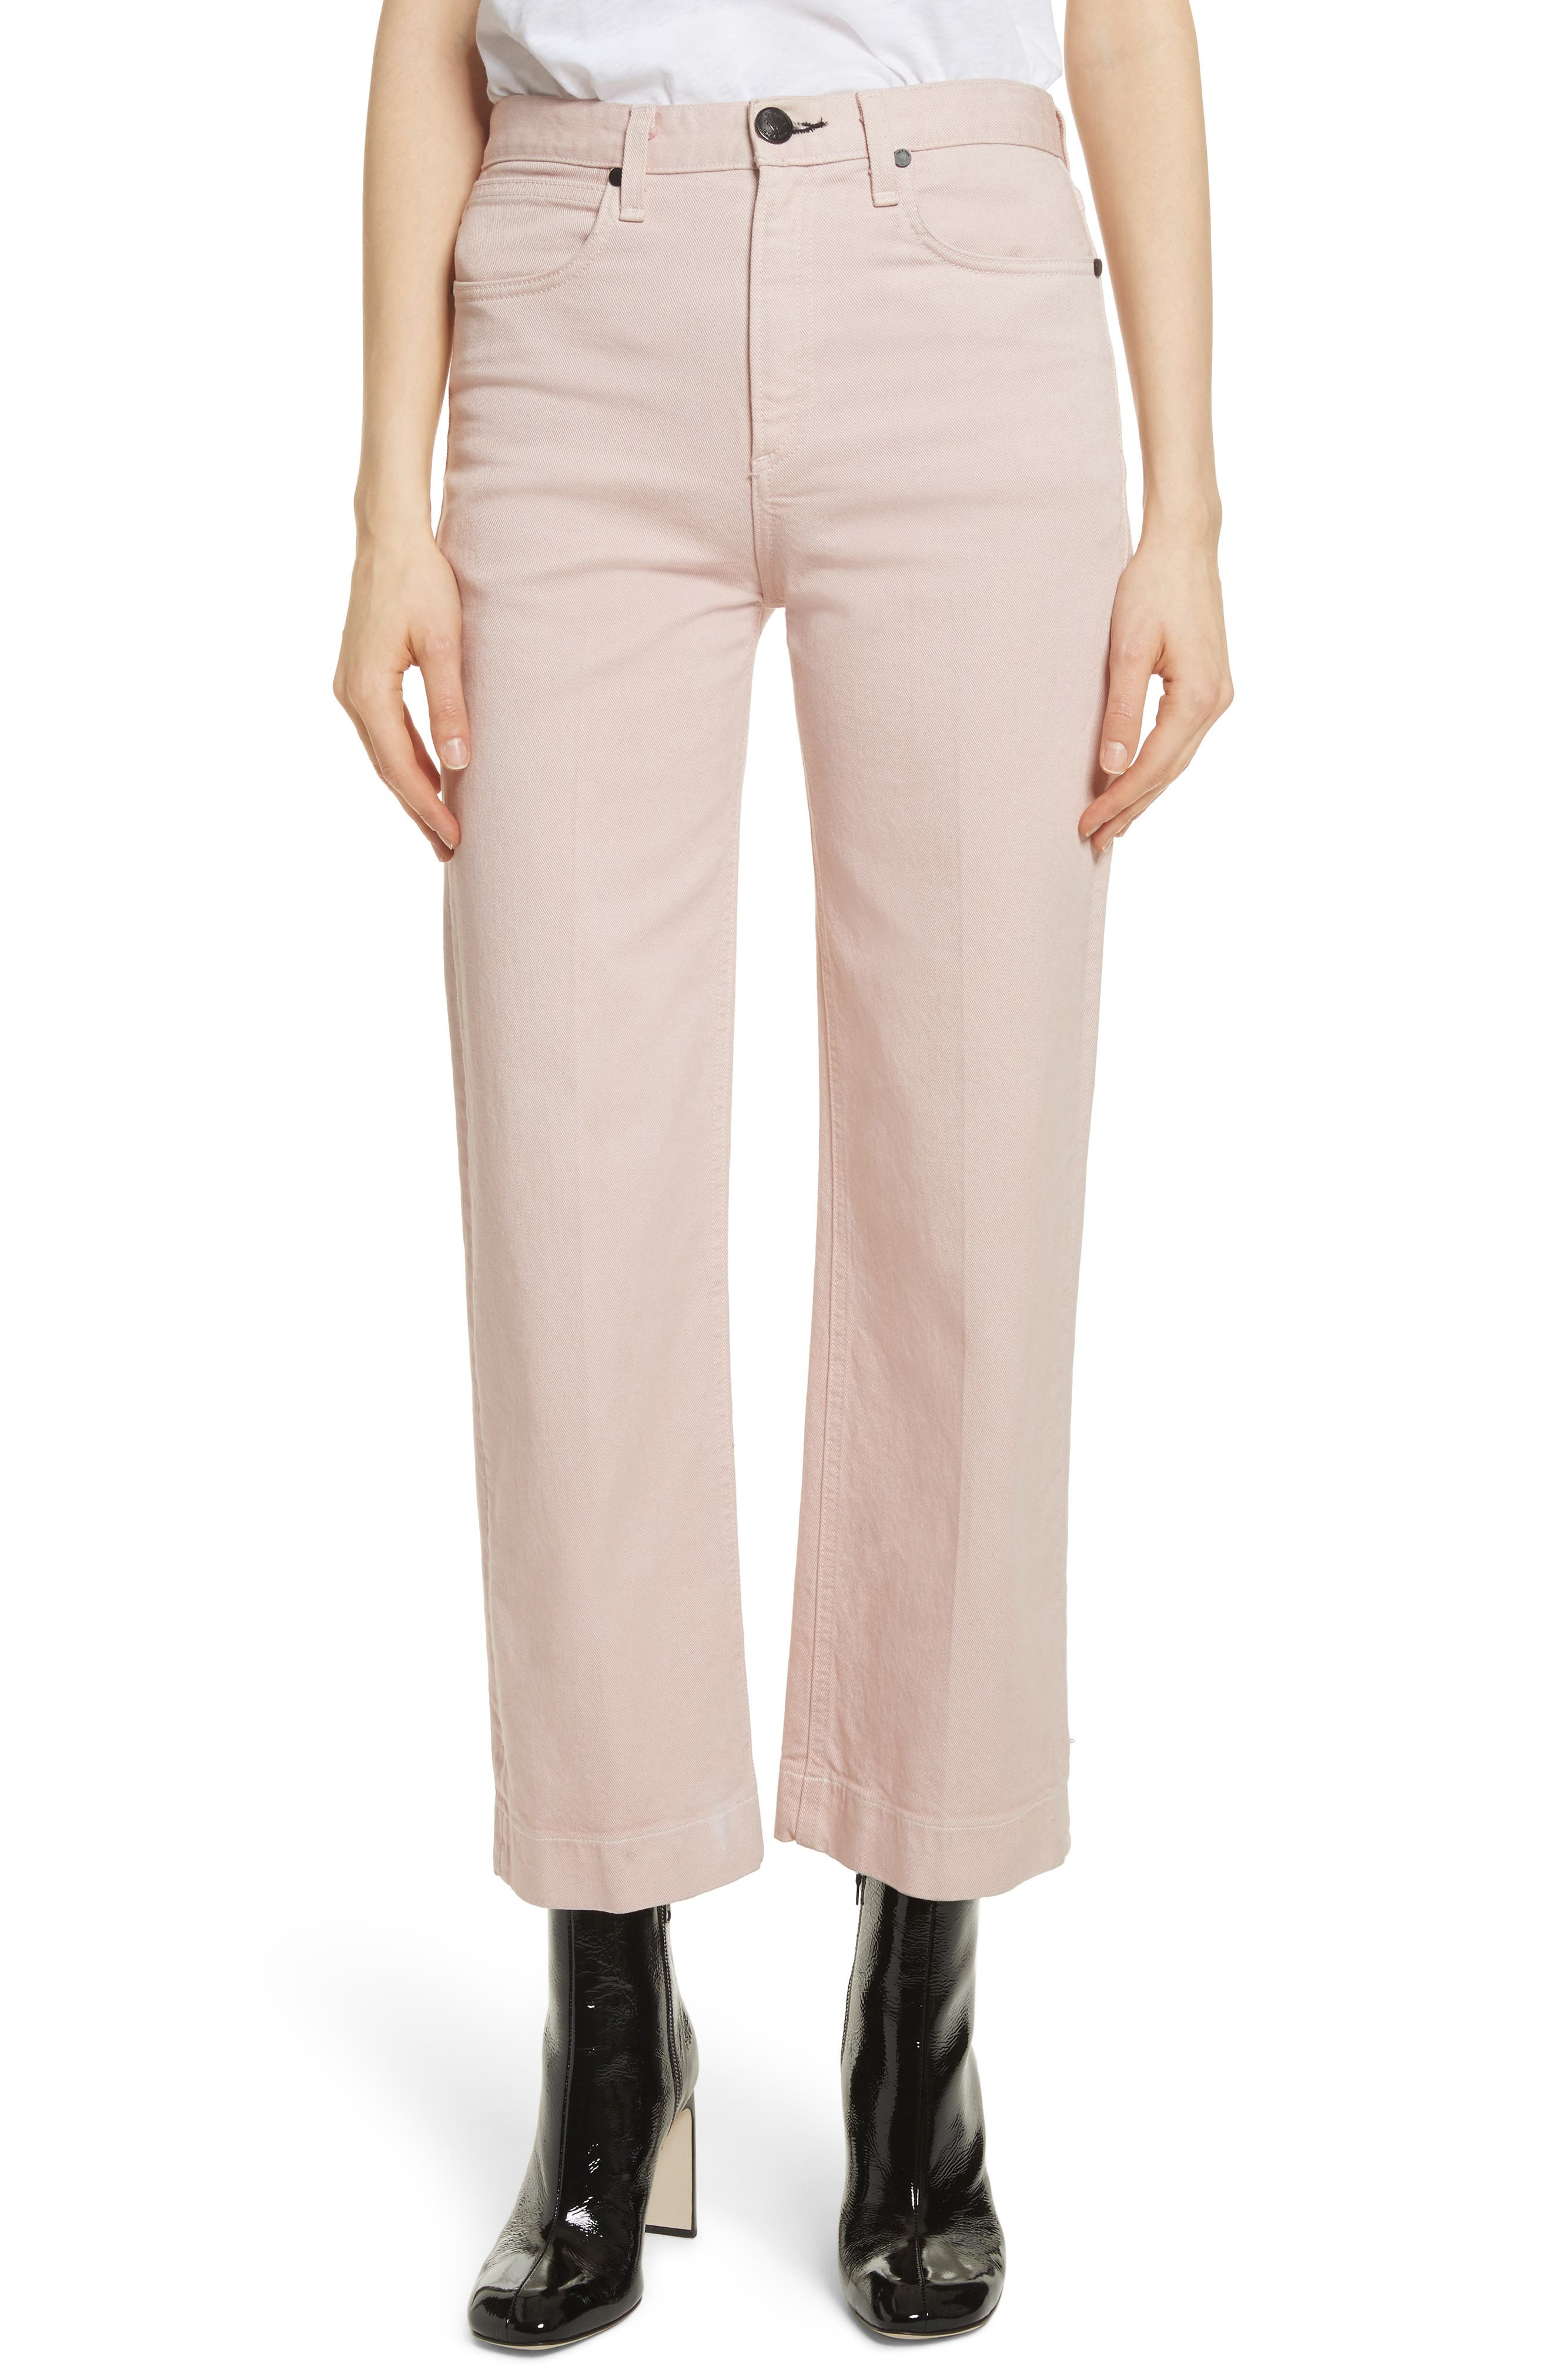 Alternate Image 1 Selected - rag & bone/JEAN Justine High Waist Trouser Jeans (Blush Twill)